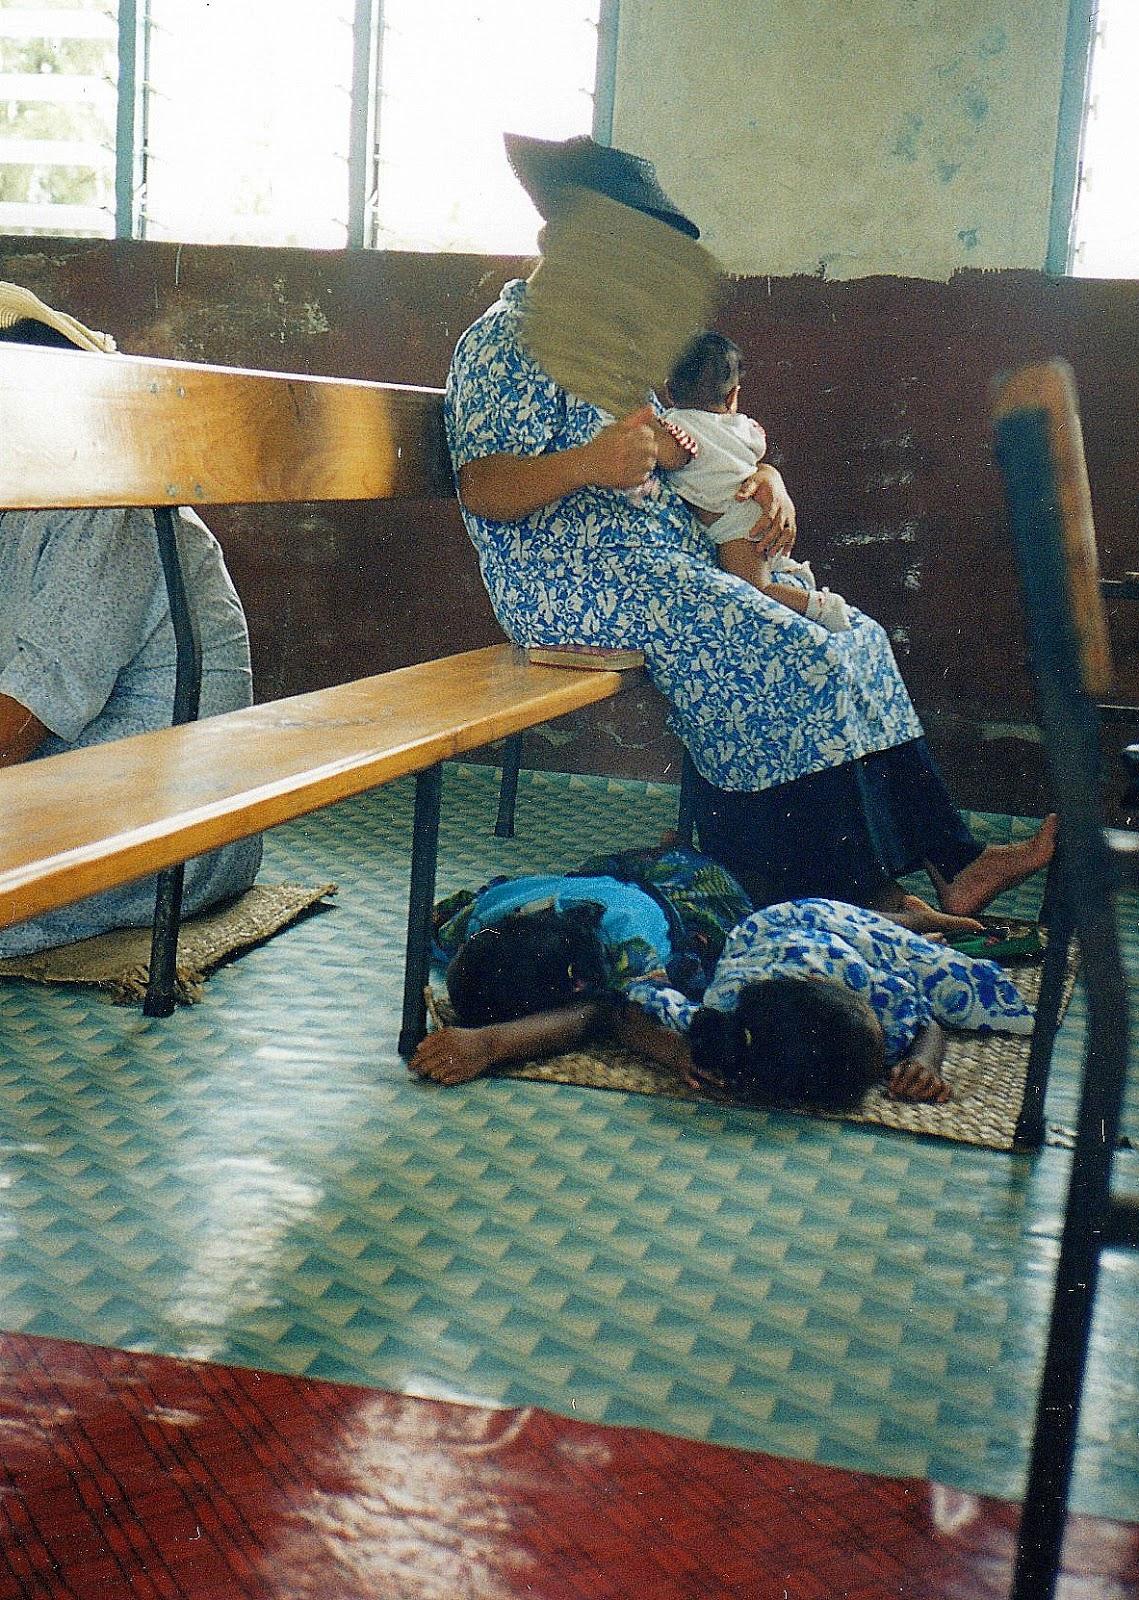 Tonga, whose inhabitants are generally avid church-goers